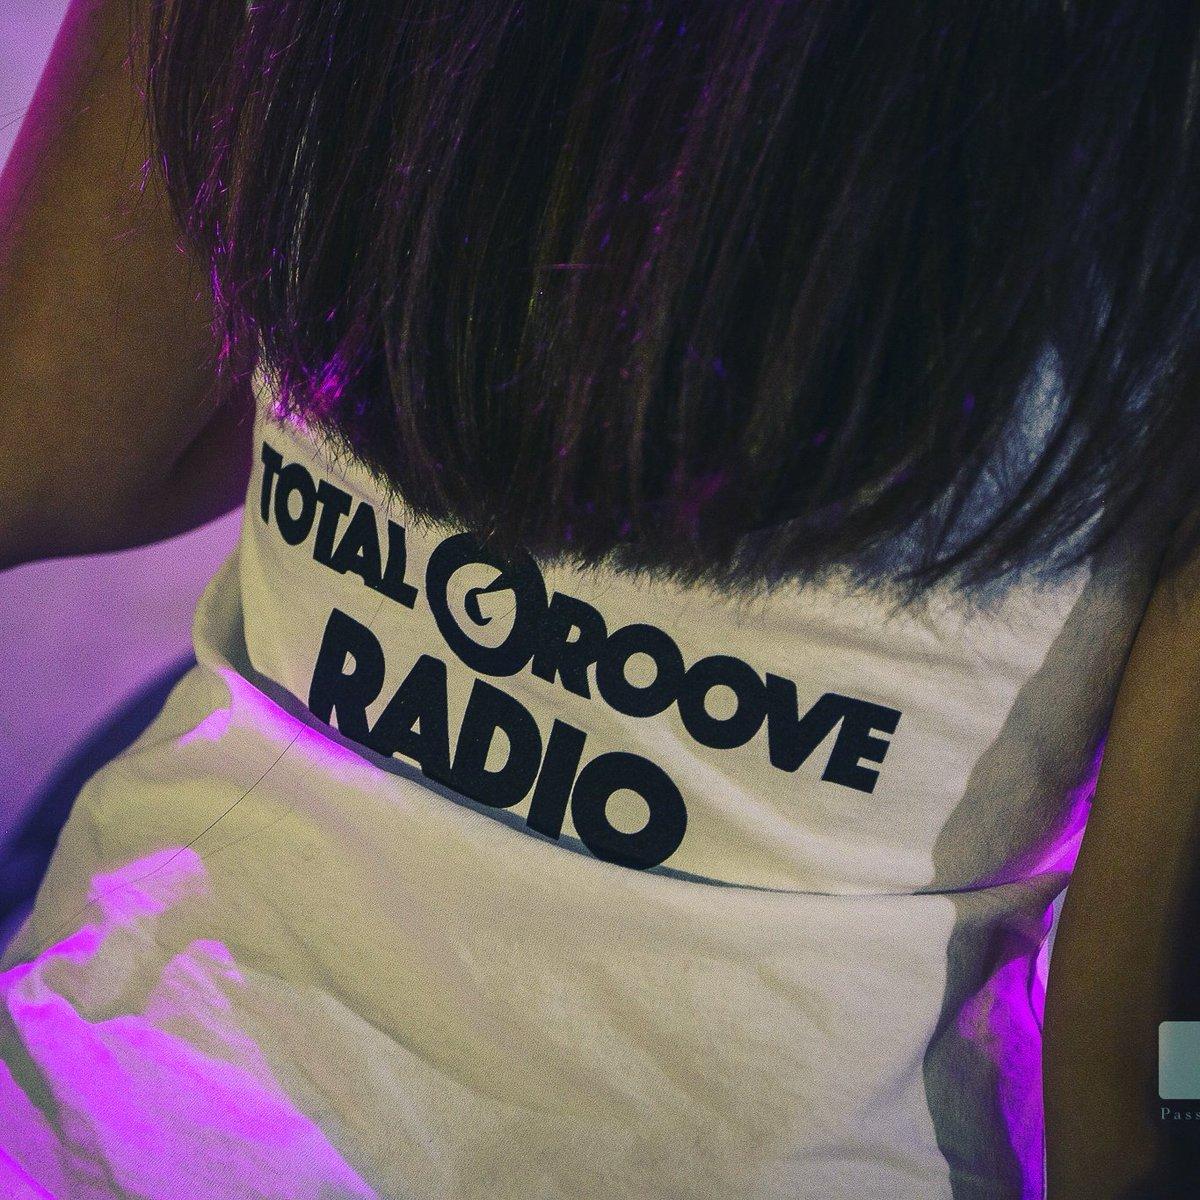 ONLY Electronic Music Radio   http://www. totalgrooveradio.com  &nbsp;   #electronic #music #dj #ibiza #mix #Electro #techno #deephouse #housemusic #Radio <br>http://pic.twitter.com/hscETjLaCR